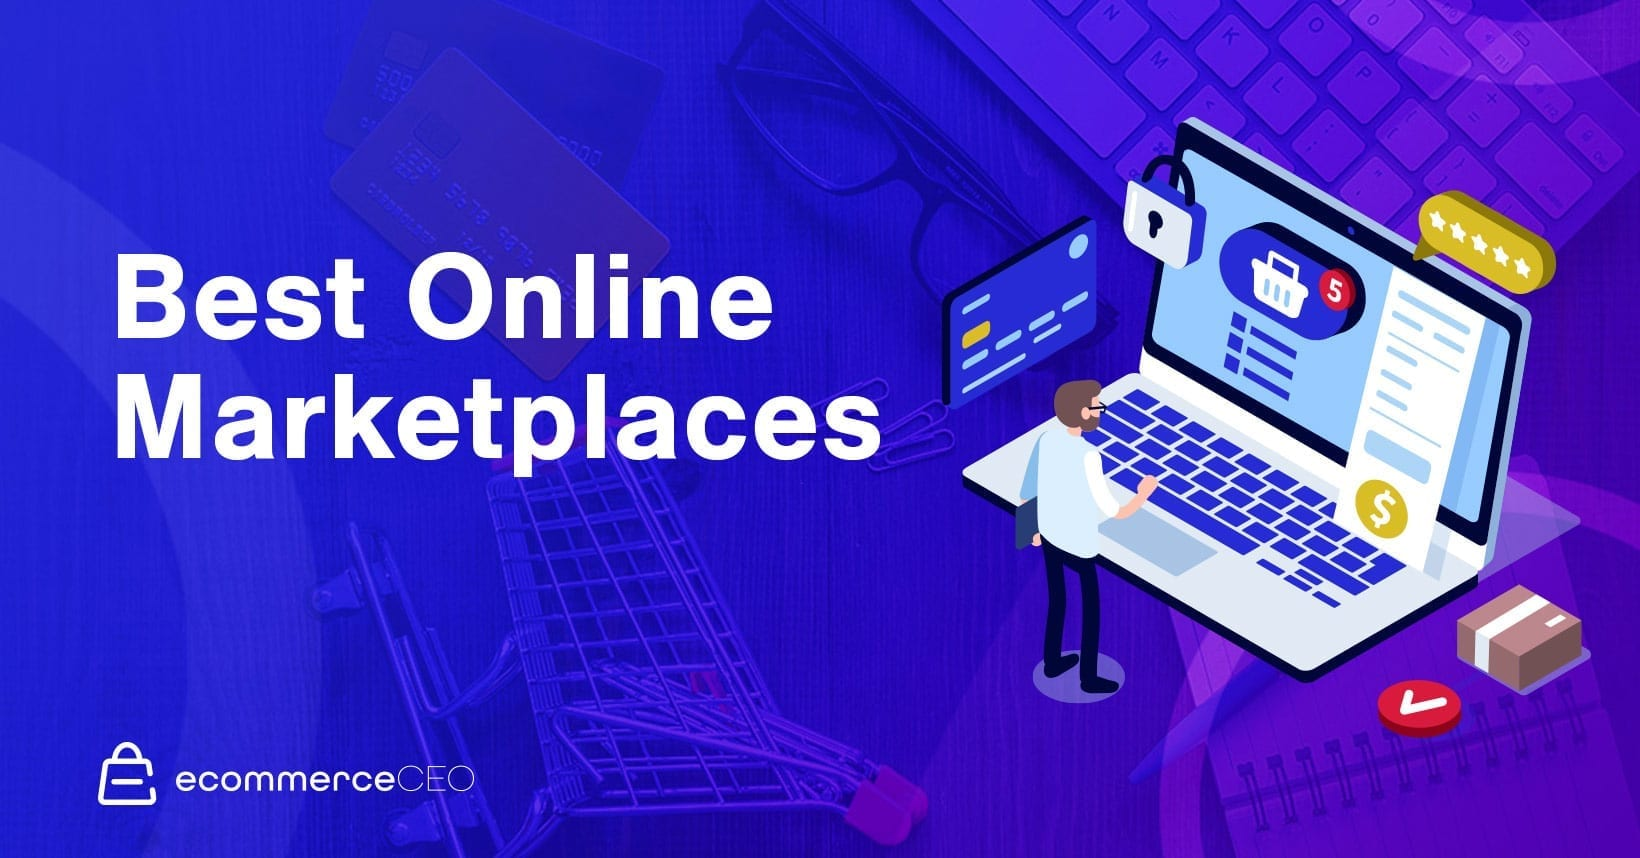 Best Online Marketplaces